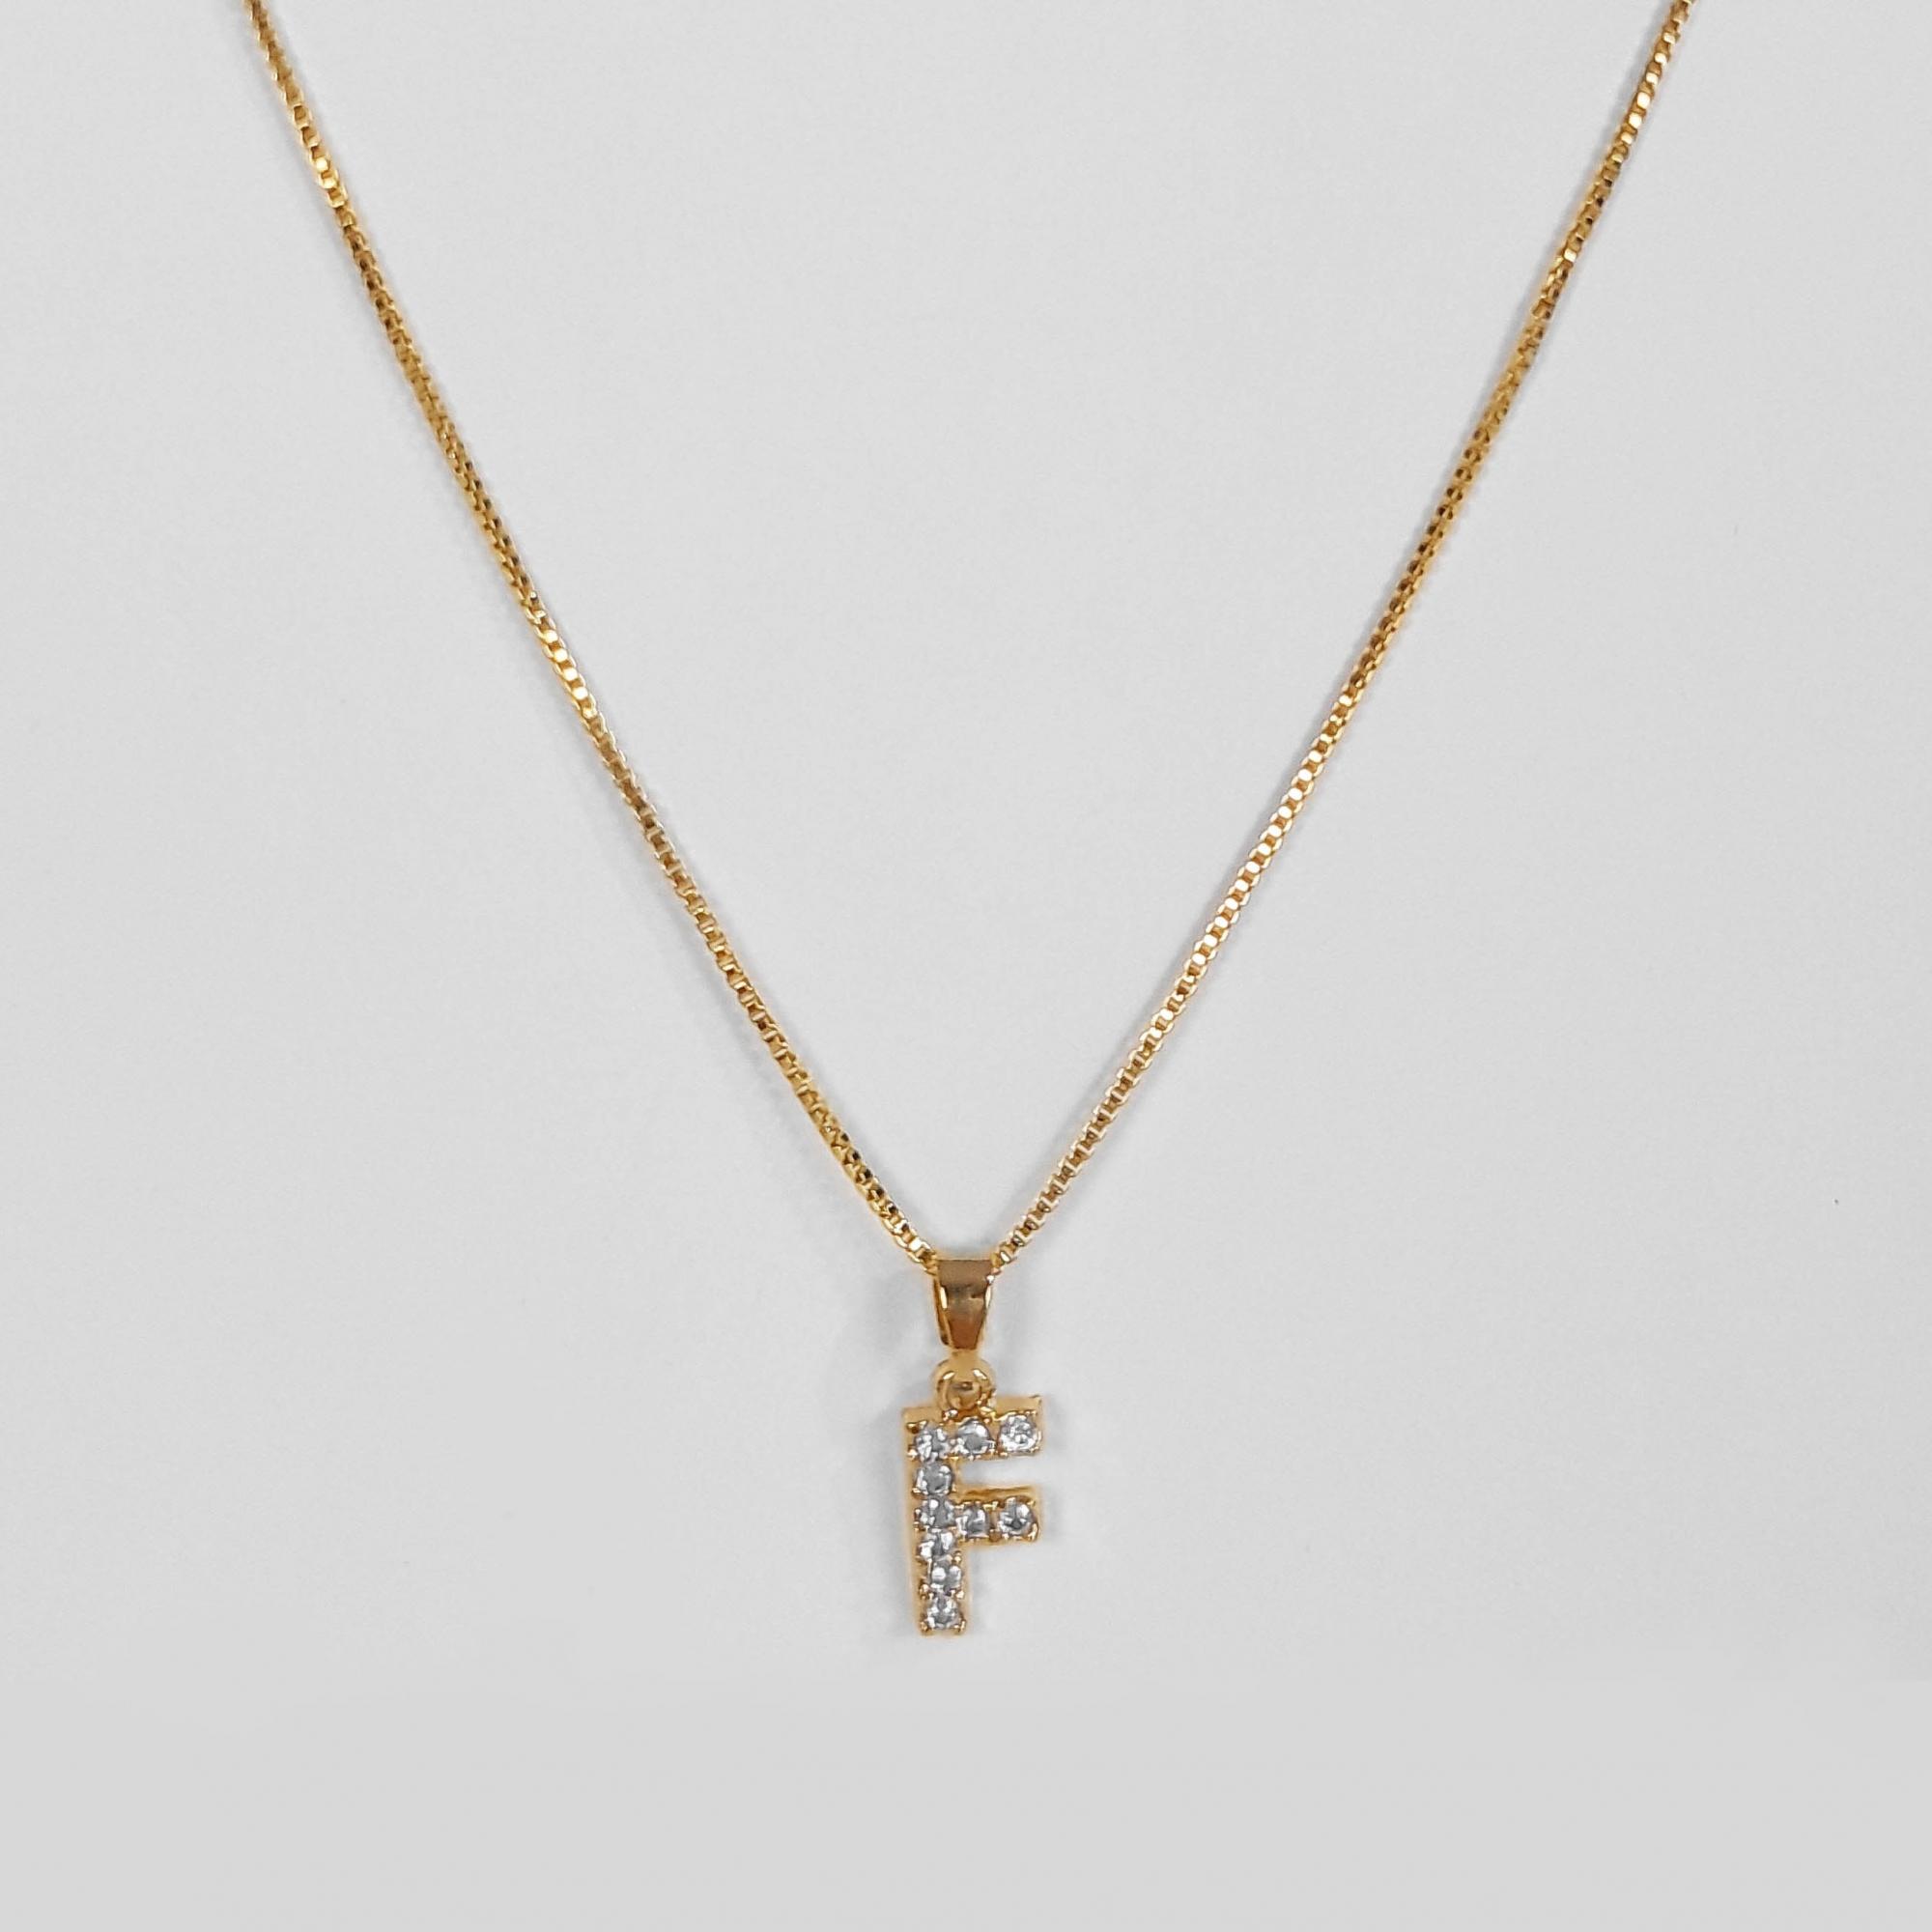 Gargantilha Letra Cravejada Micro Zircônia Folheado Ouro 18k  - Lunozê Joias